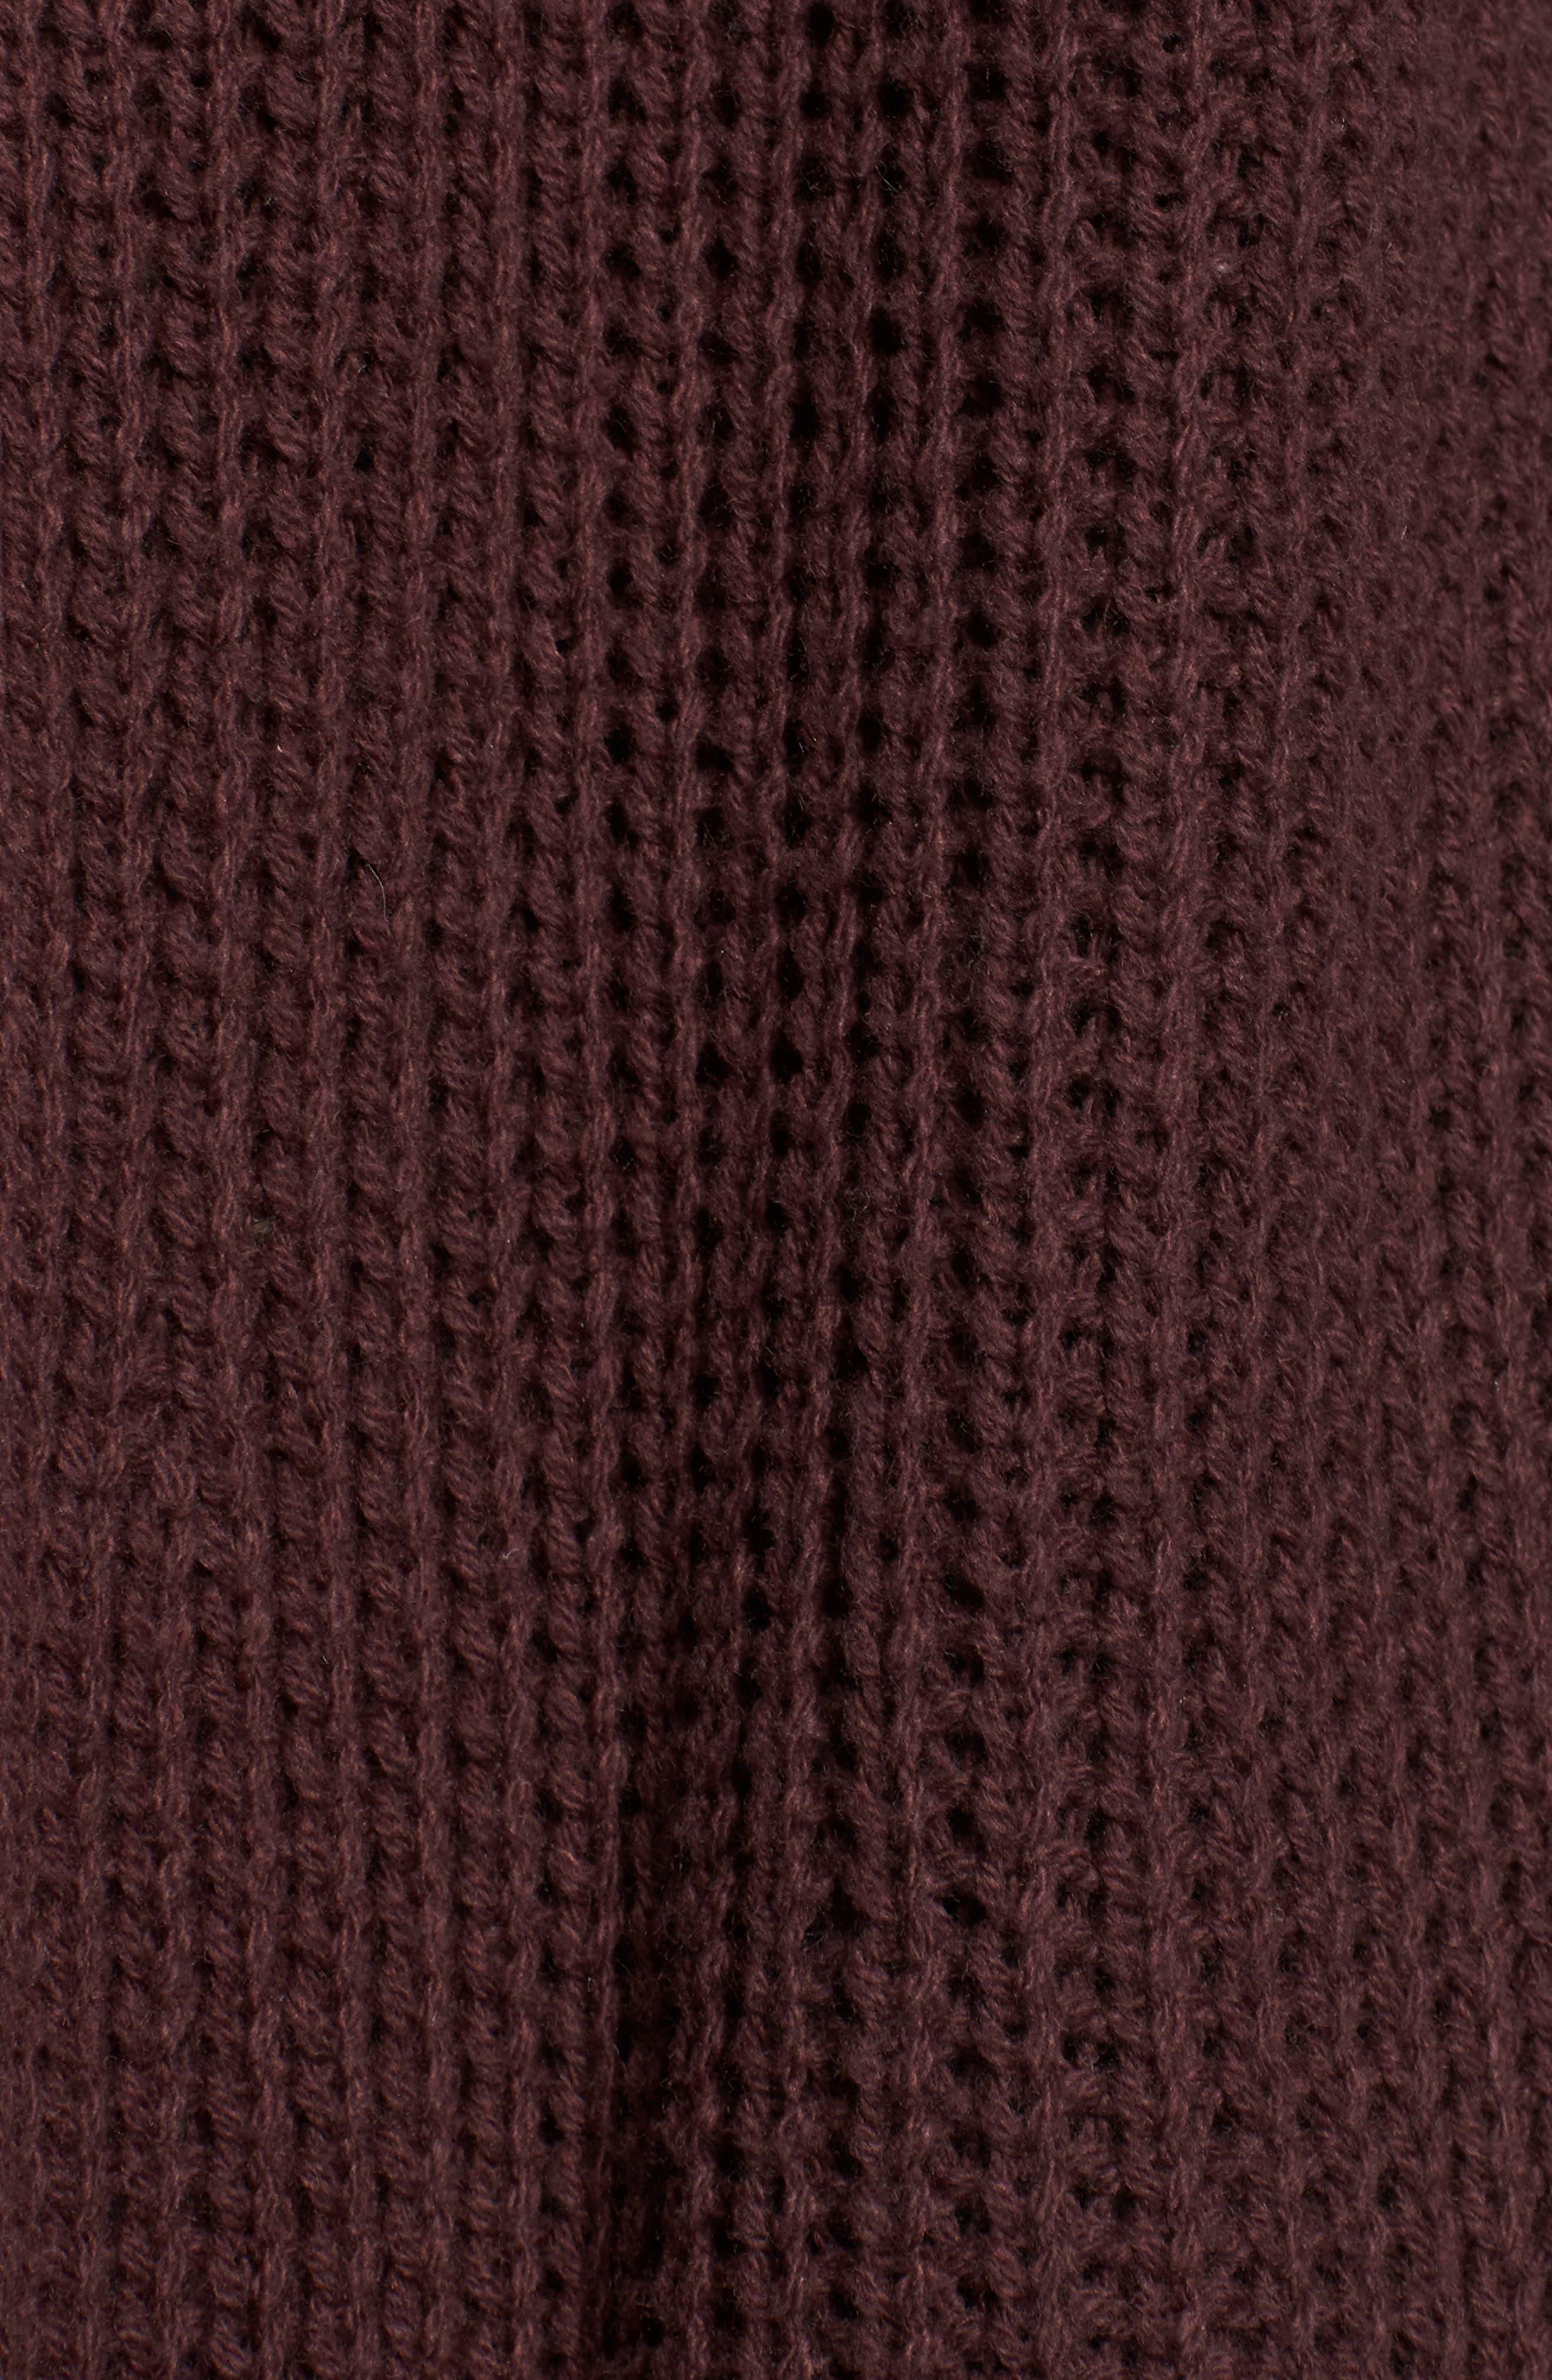 Lace-Up Back Cardigan,                             Alternate thumbnail 6, color,                             938